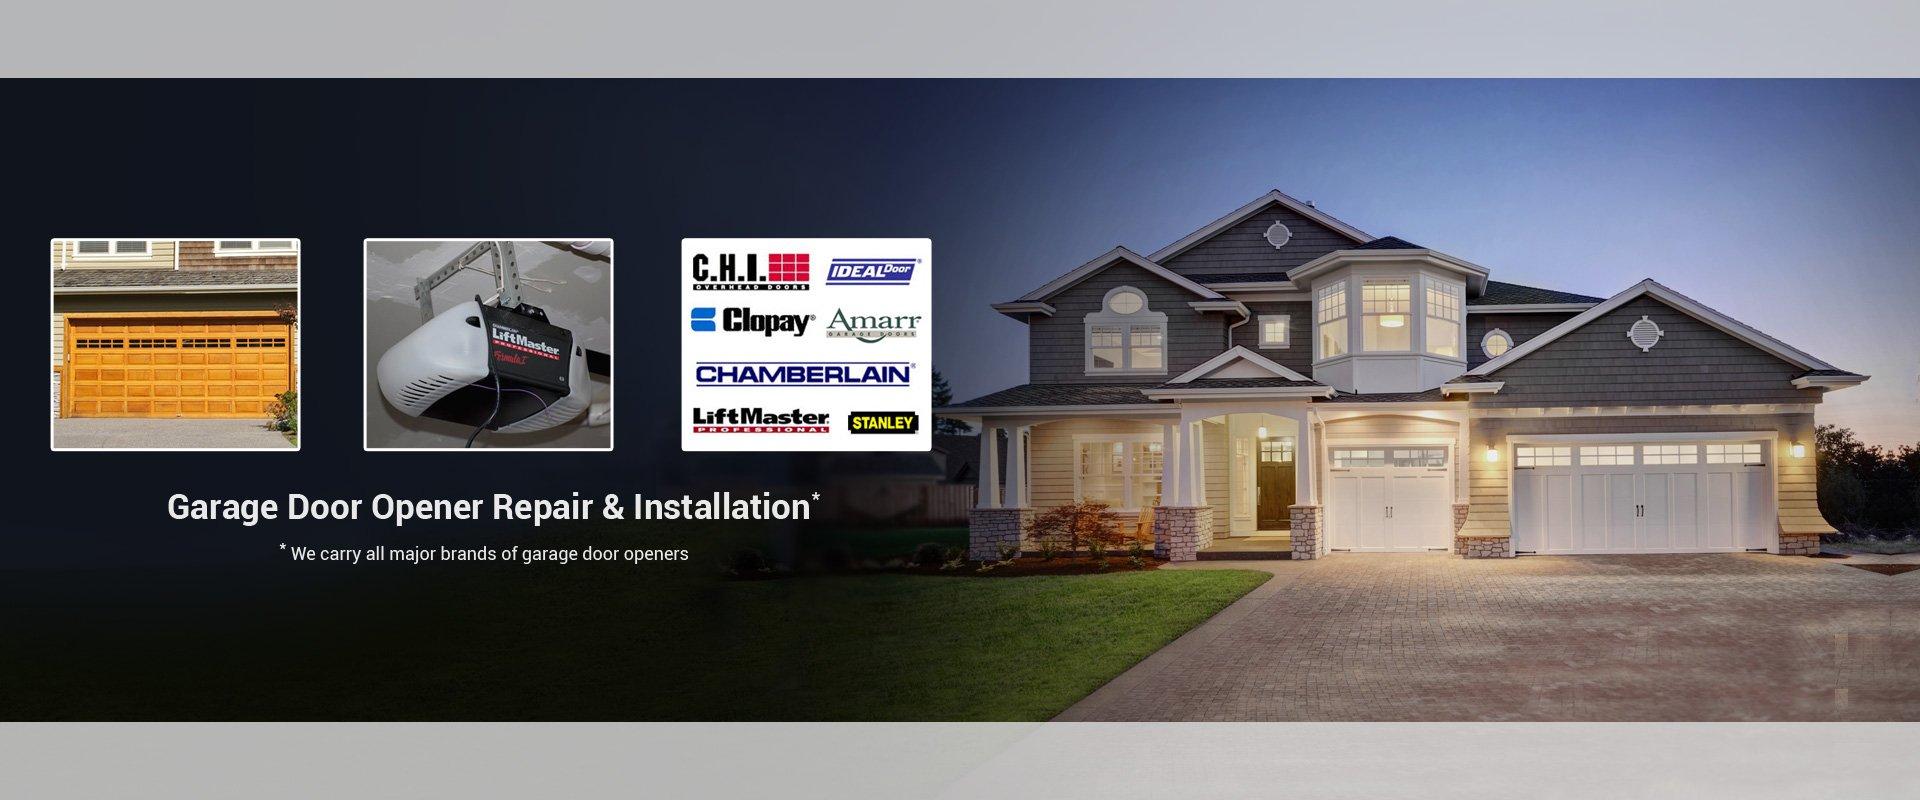 Garage Door Opener Repair And Installation Services Simi Valley CA